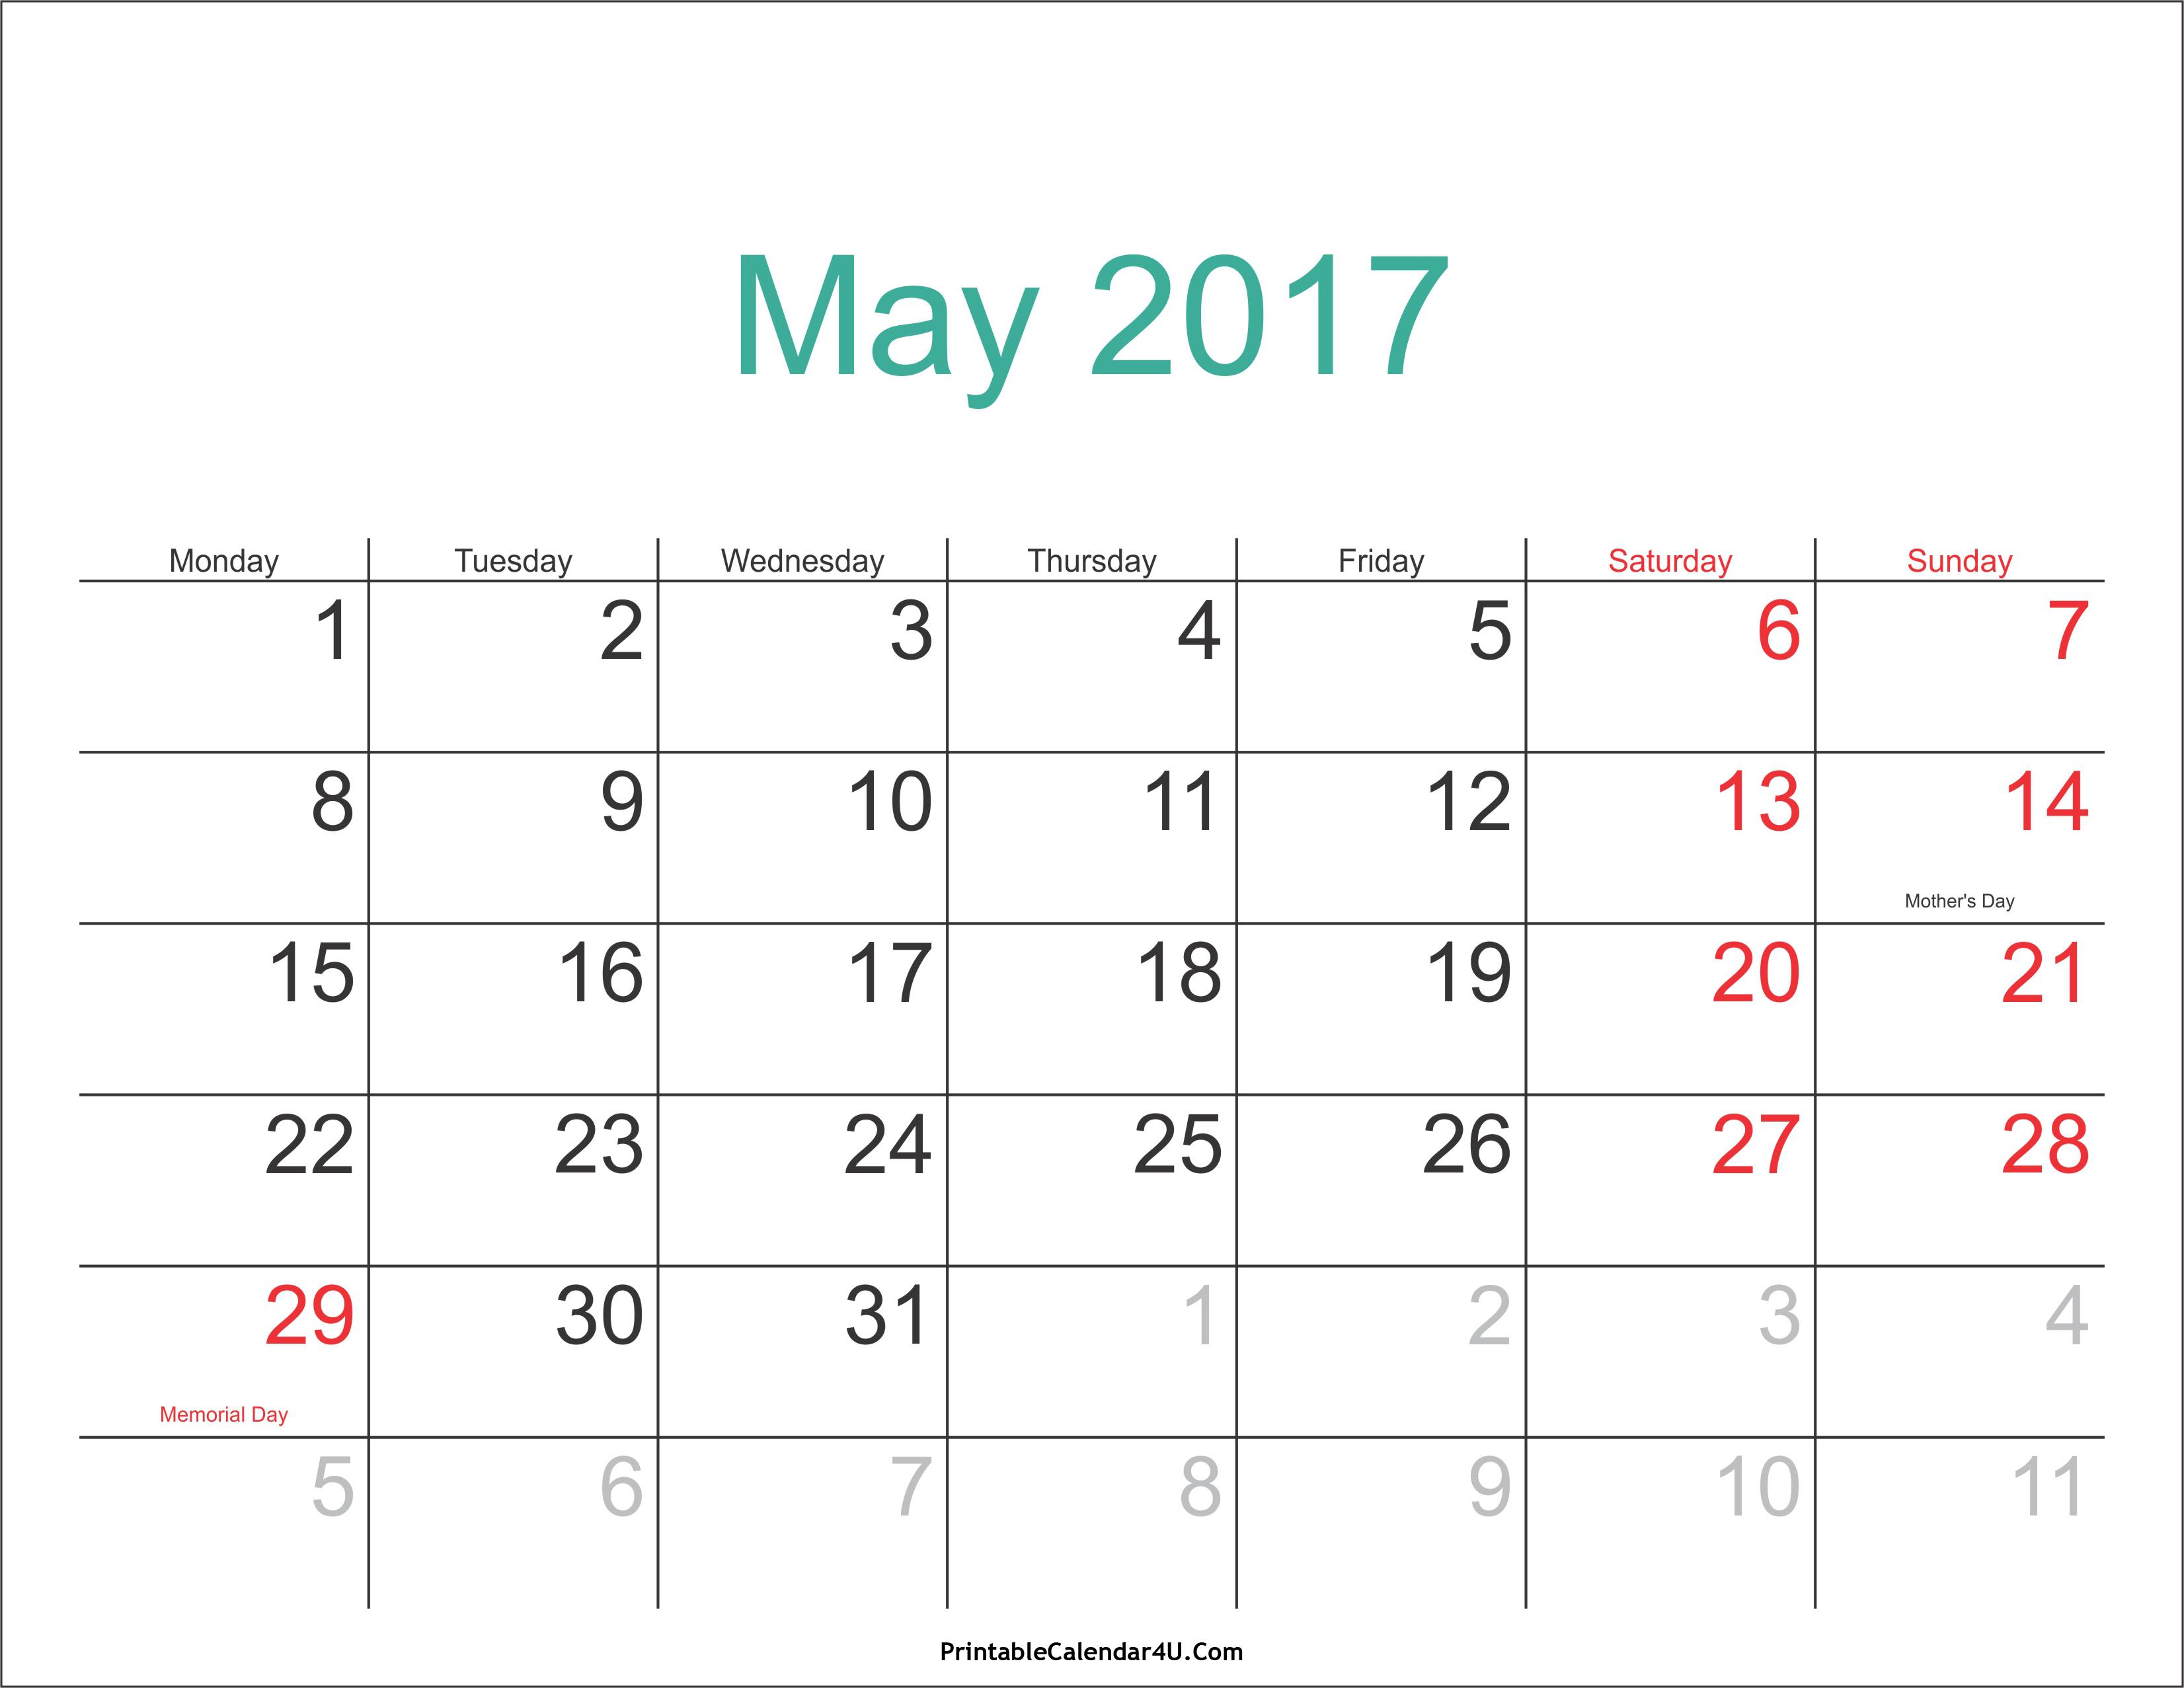 May 2017 Calendar with Holidays 3 Printable Calendar 2016 2017